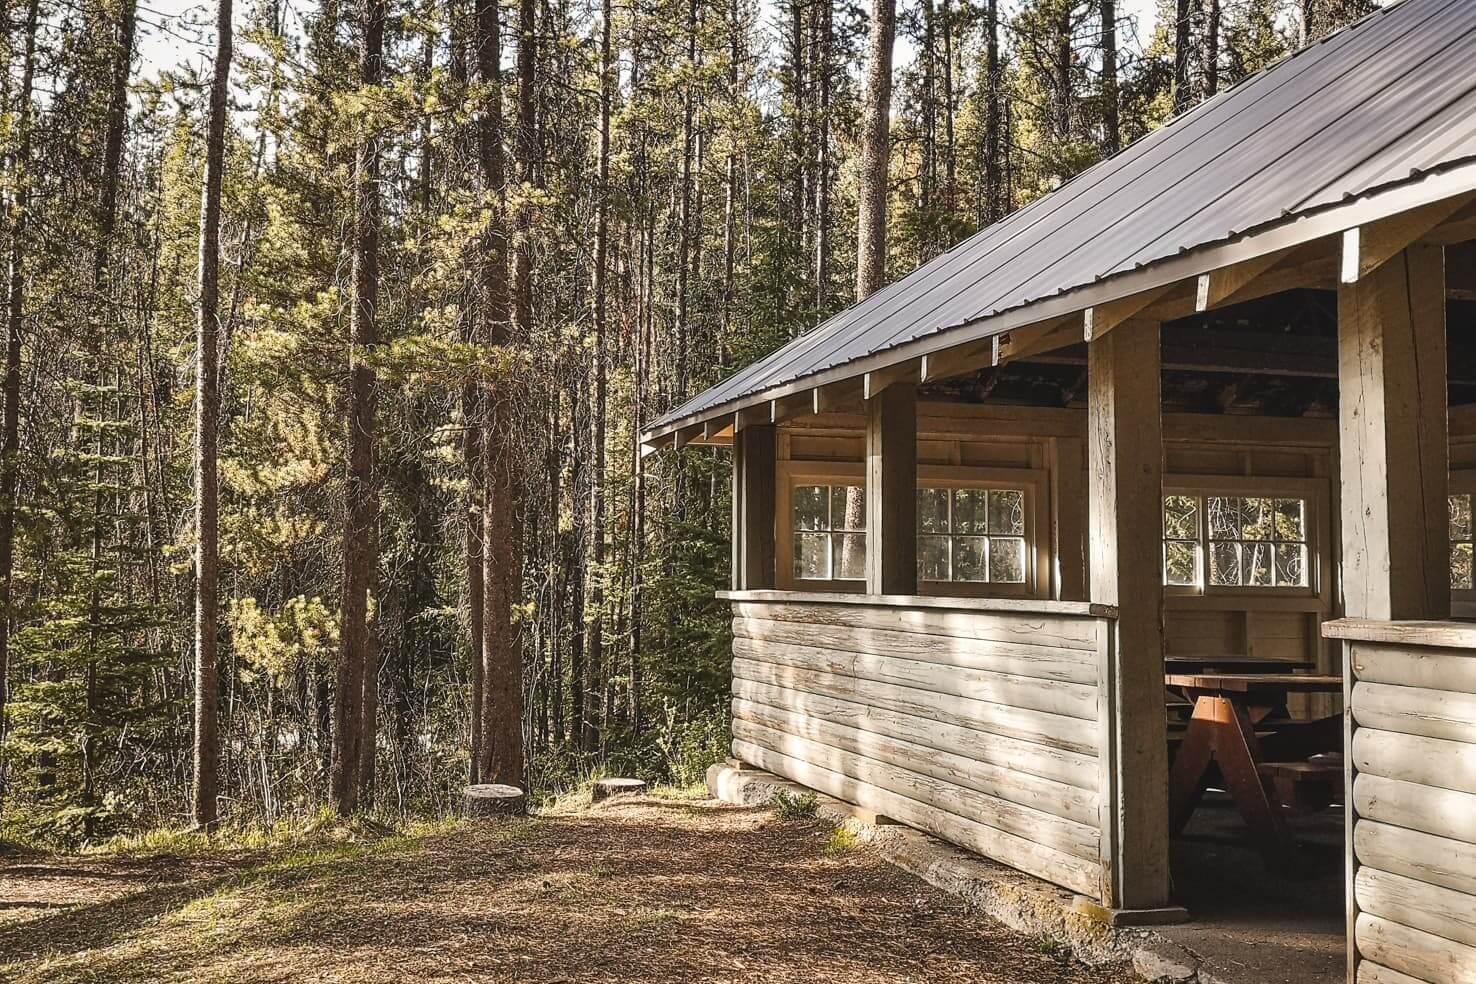 Camping in Jasper National Park - Jonas Creek Campground